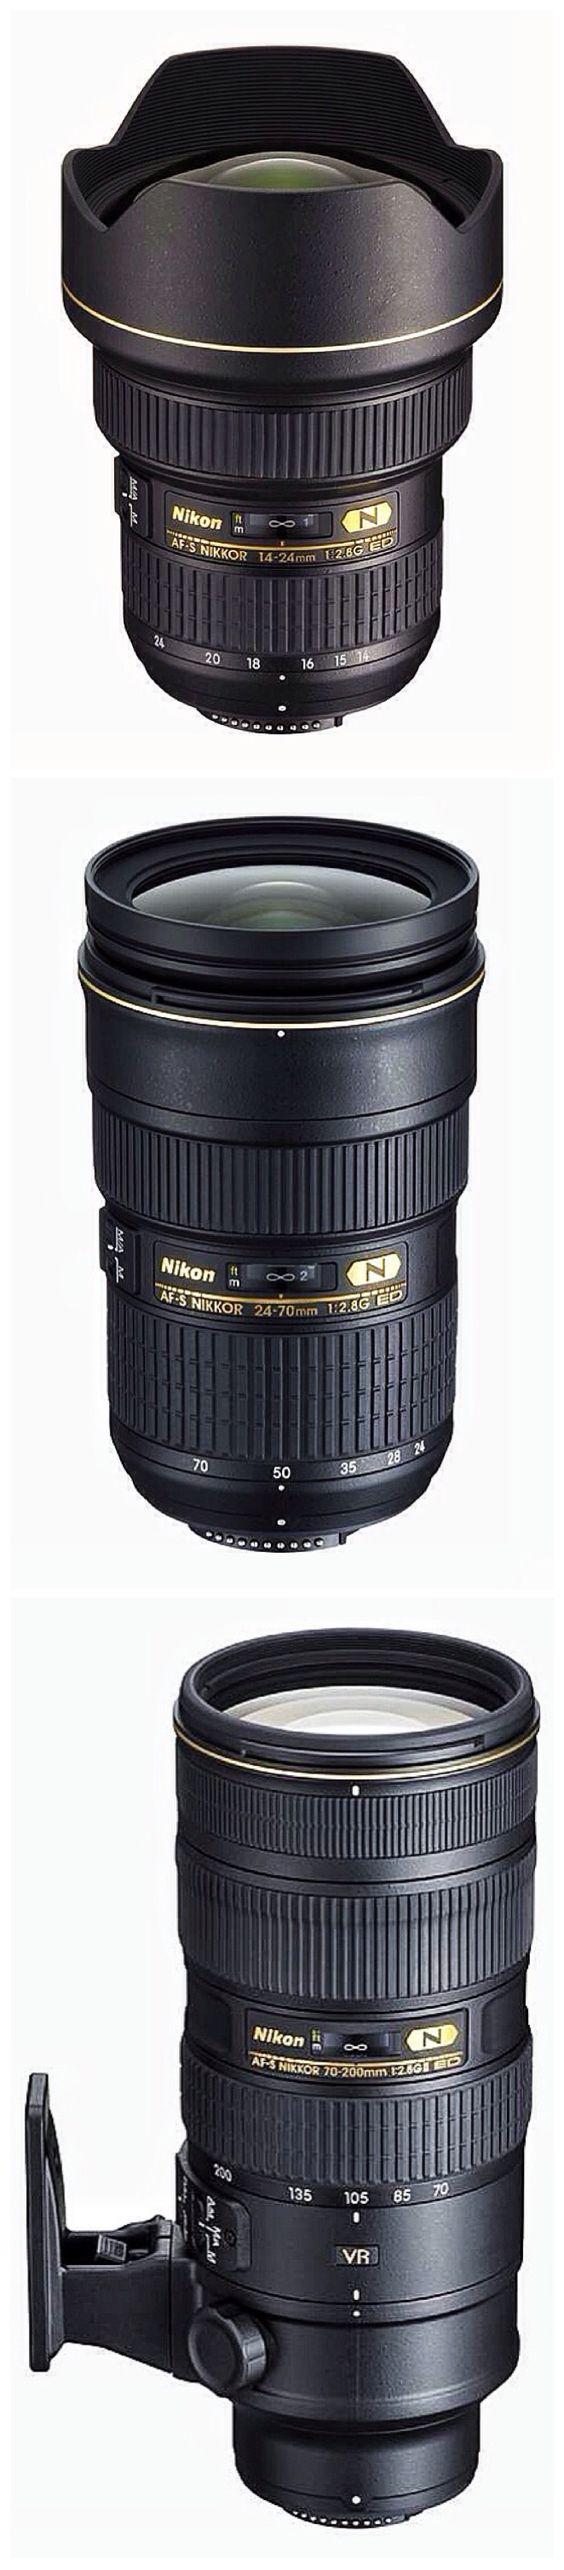 Nikon 14 24mm Photos   Google Search | Nikon 14 24mm Lens Photou0027s |  Pinterest